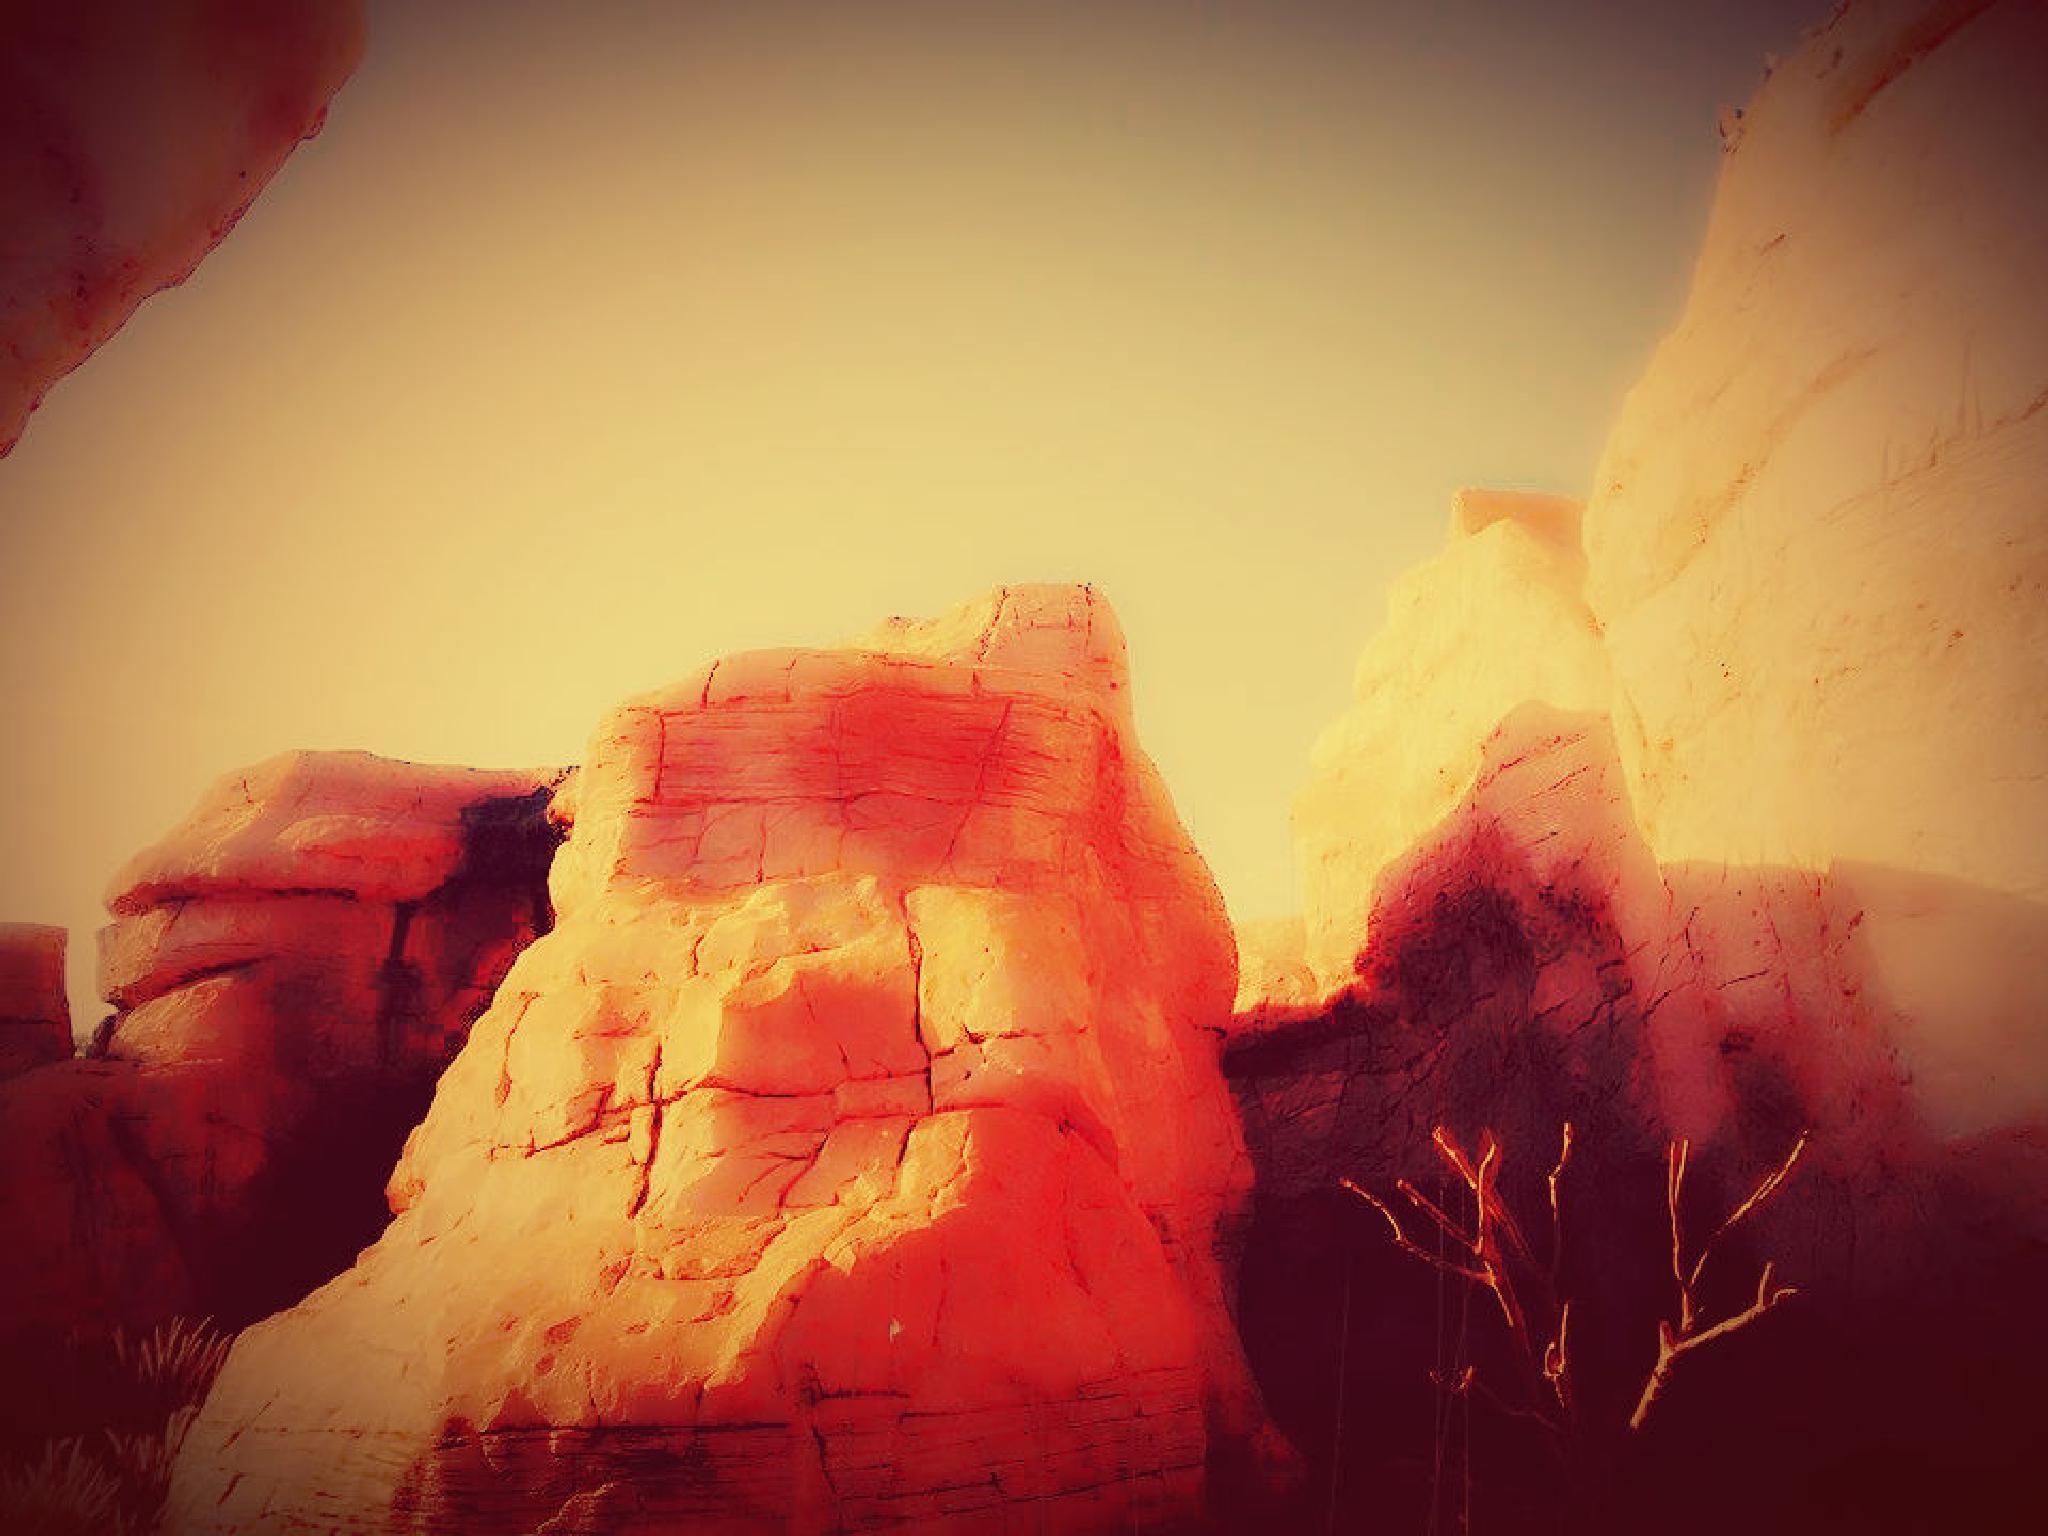 ROCKS by Nadia.g